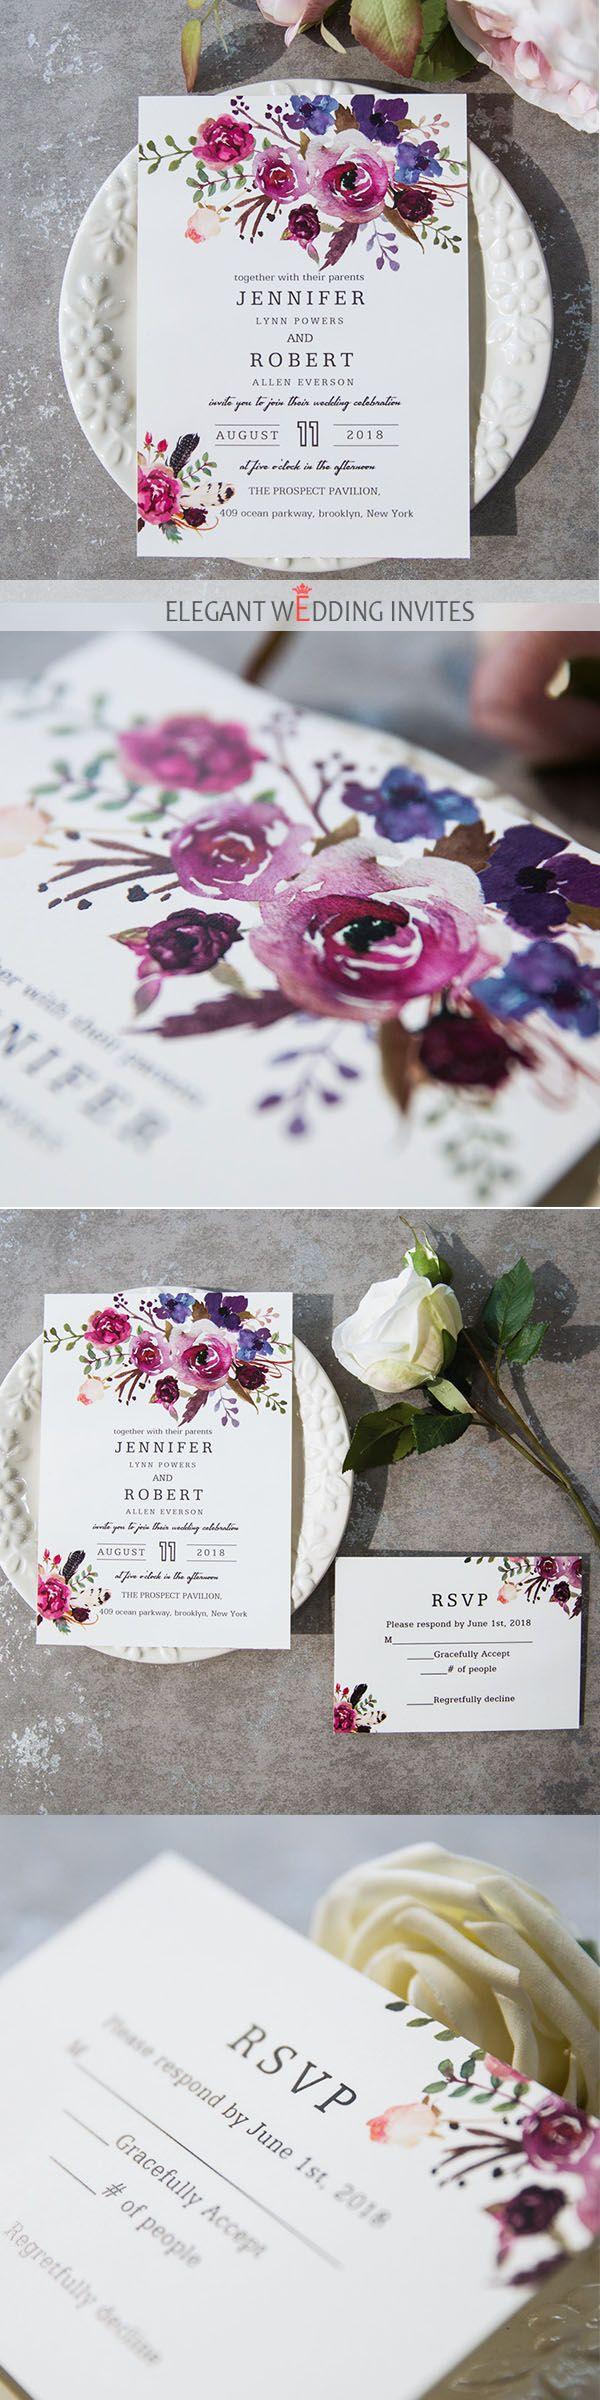 wedding card wordings simple%0A as low as       spring magenta shades of purple wedding invitations  weddinginvitations ElegantWeddingInvites